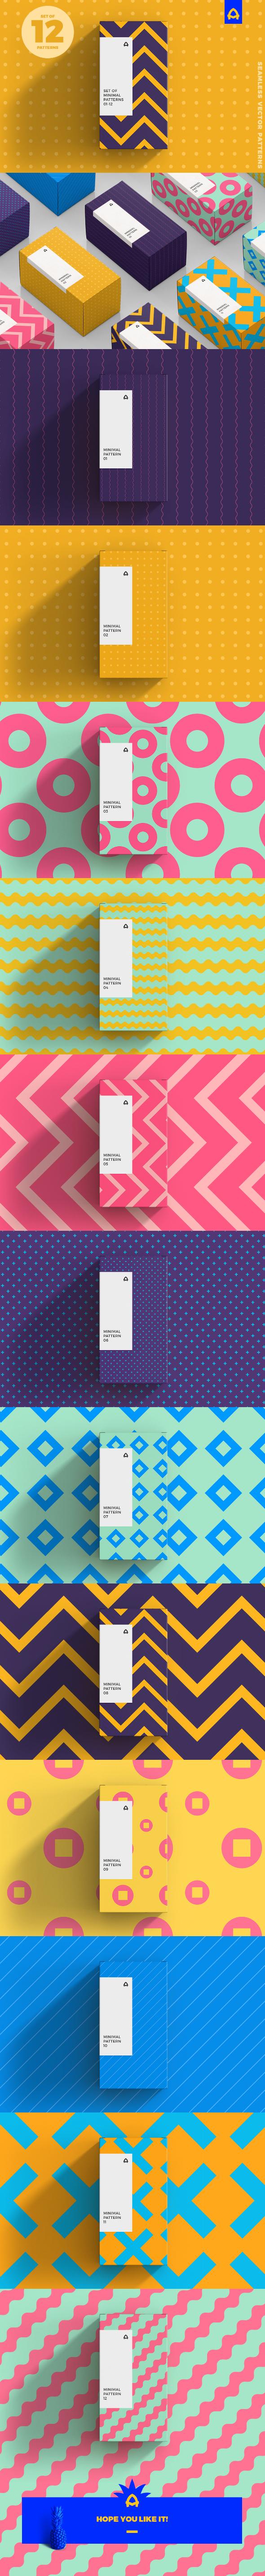 Set of Minimal Patterns - Textures / Fills / Patterns Illustrator